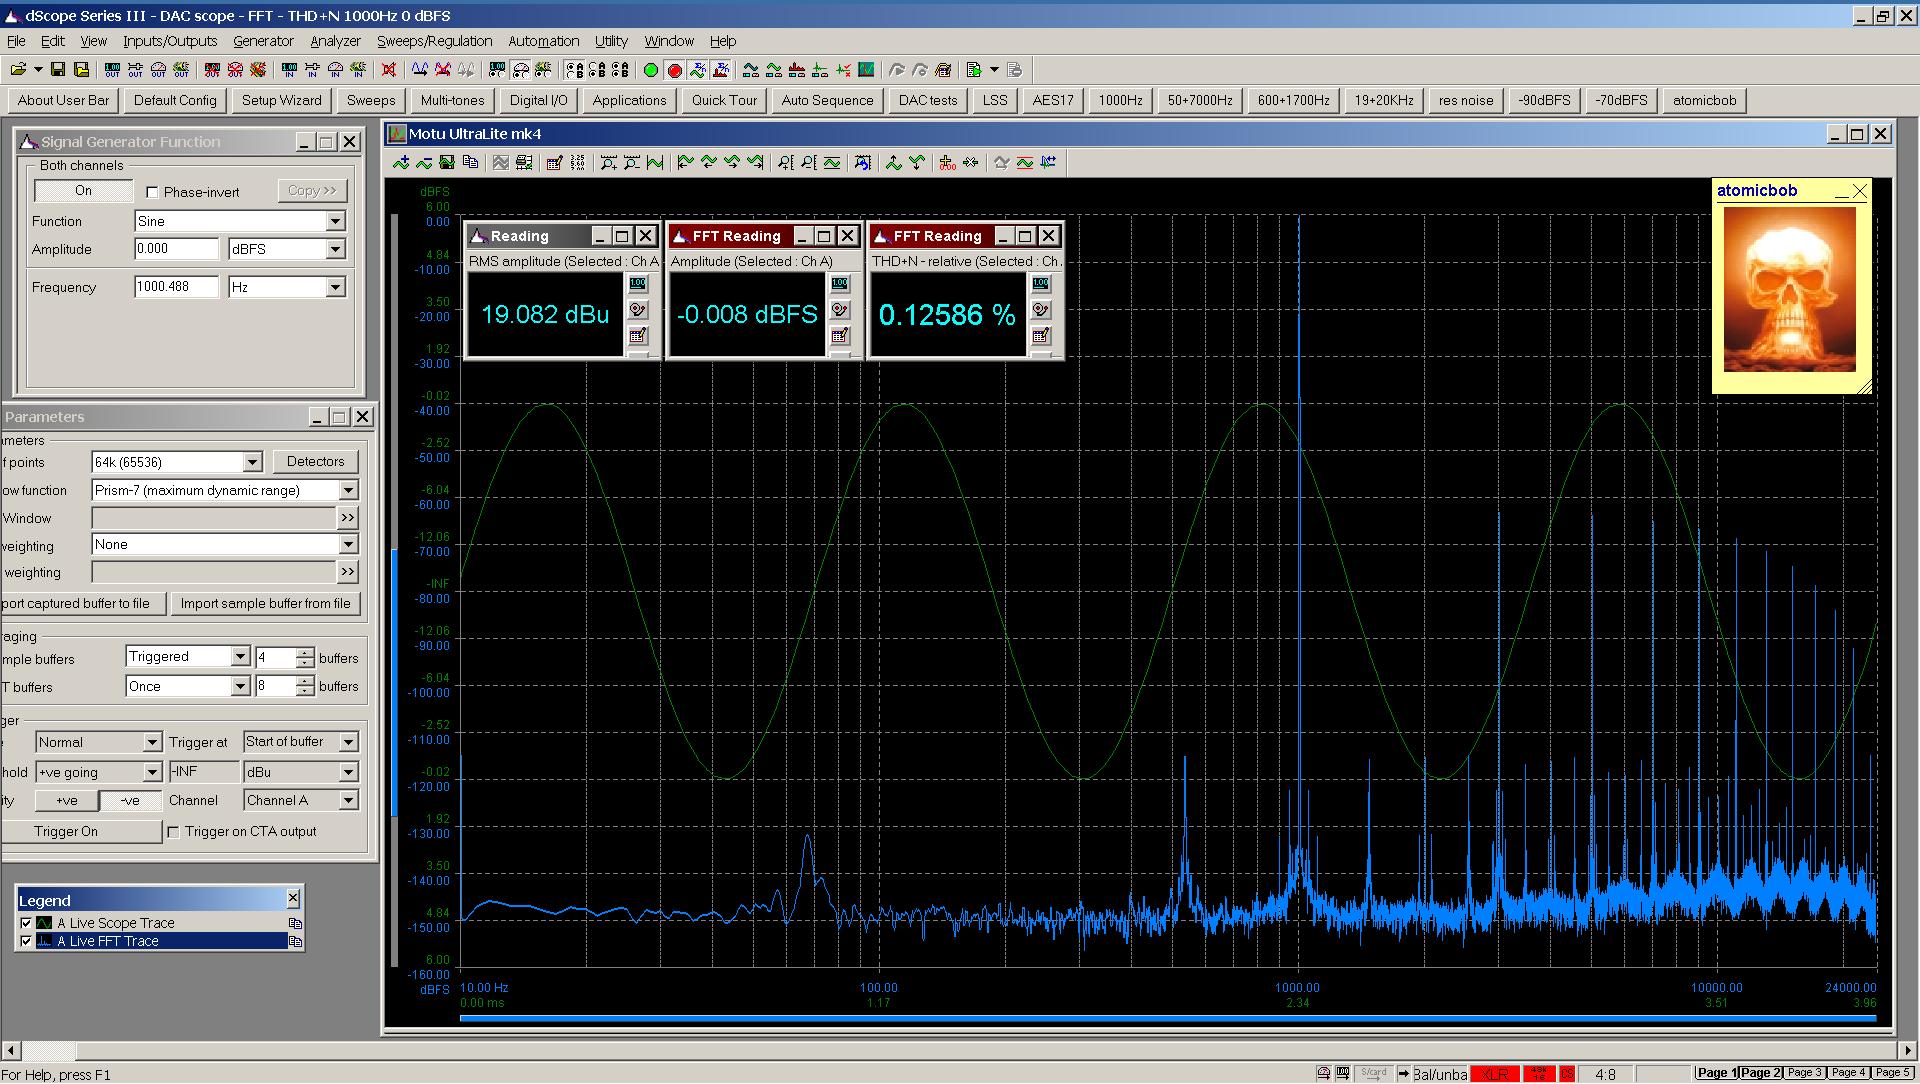 20200531-01 UltraLite-mk4 THD+N FFT 0_0 dBFS - spdif Bal.png